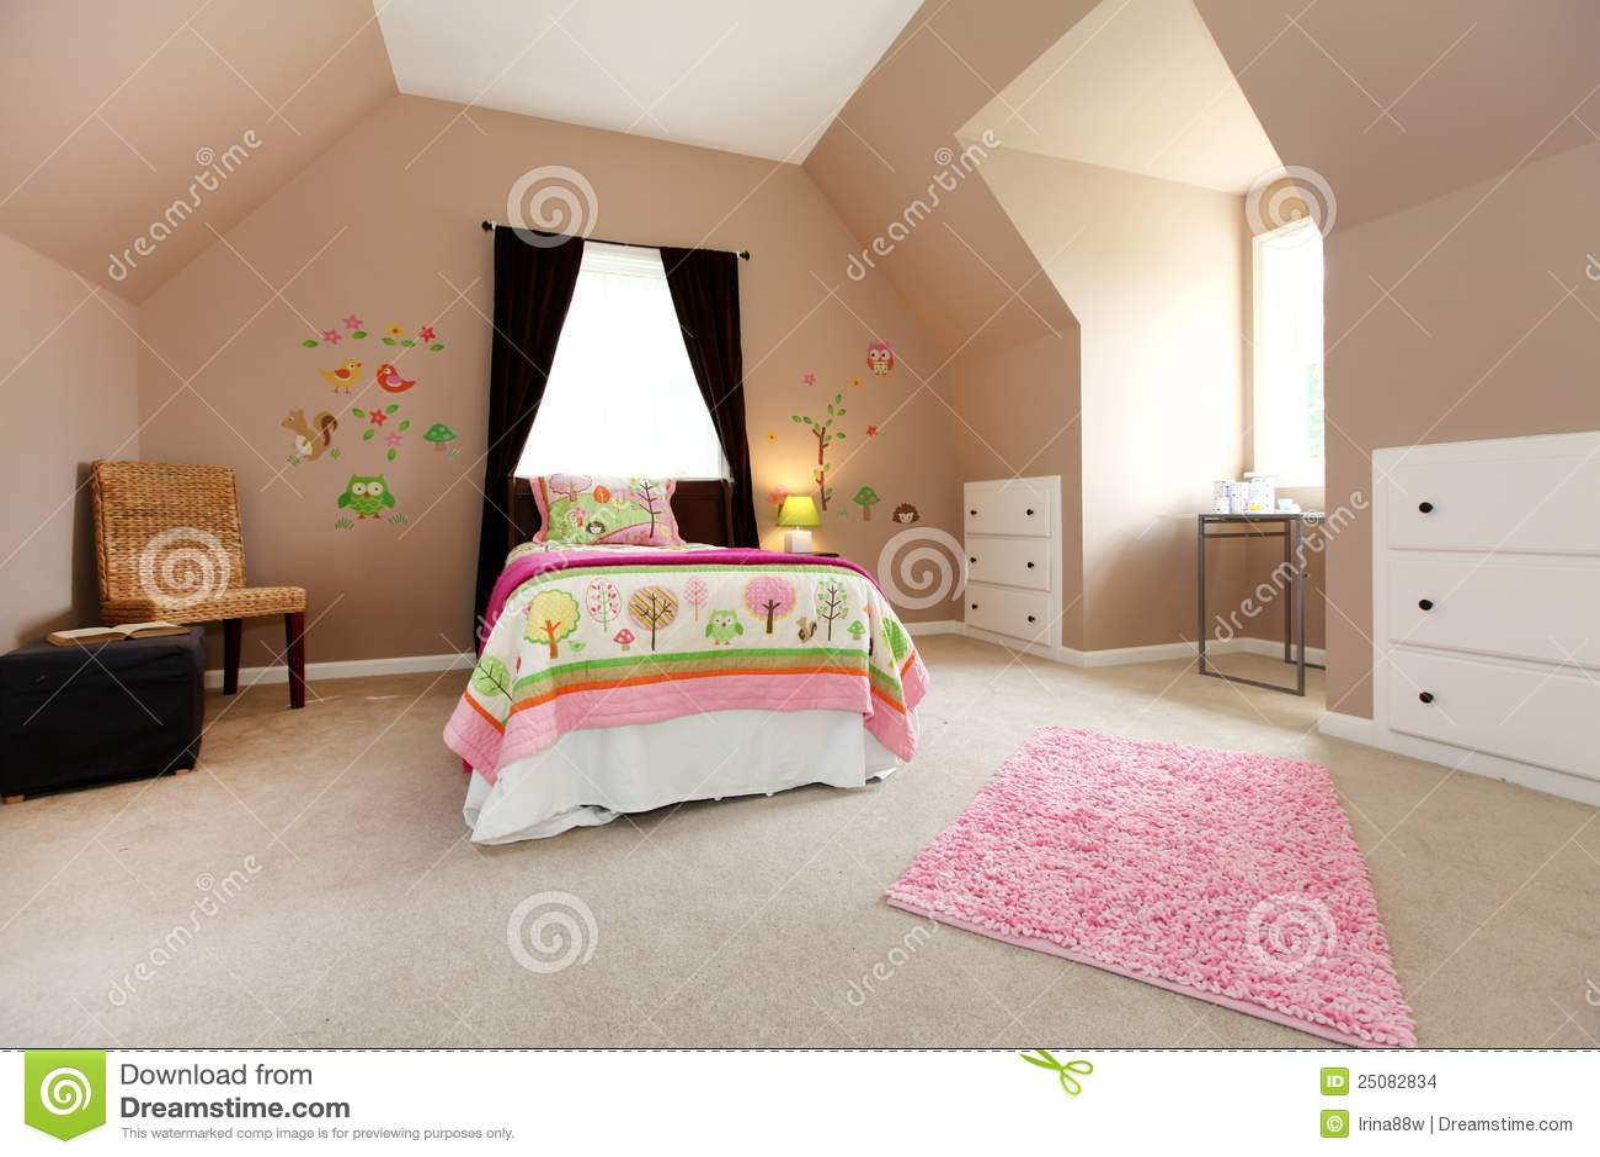 Ontwerp Kleine Slaapkamers Echt